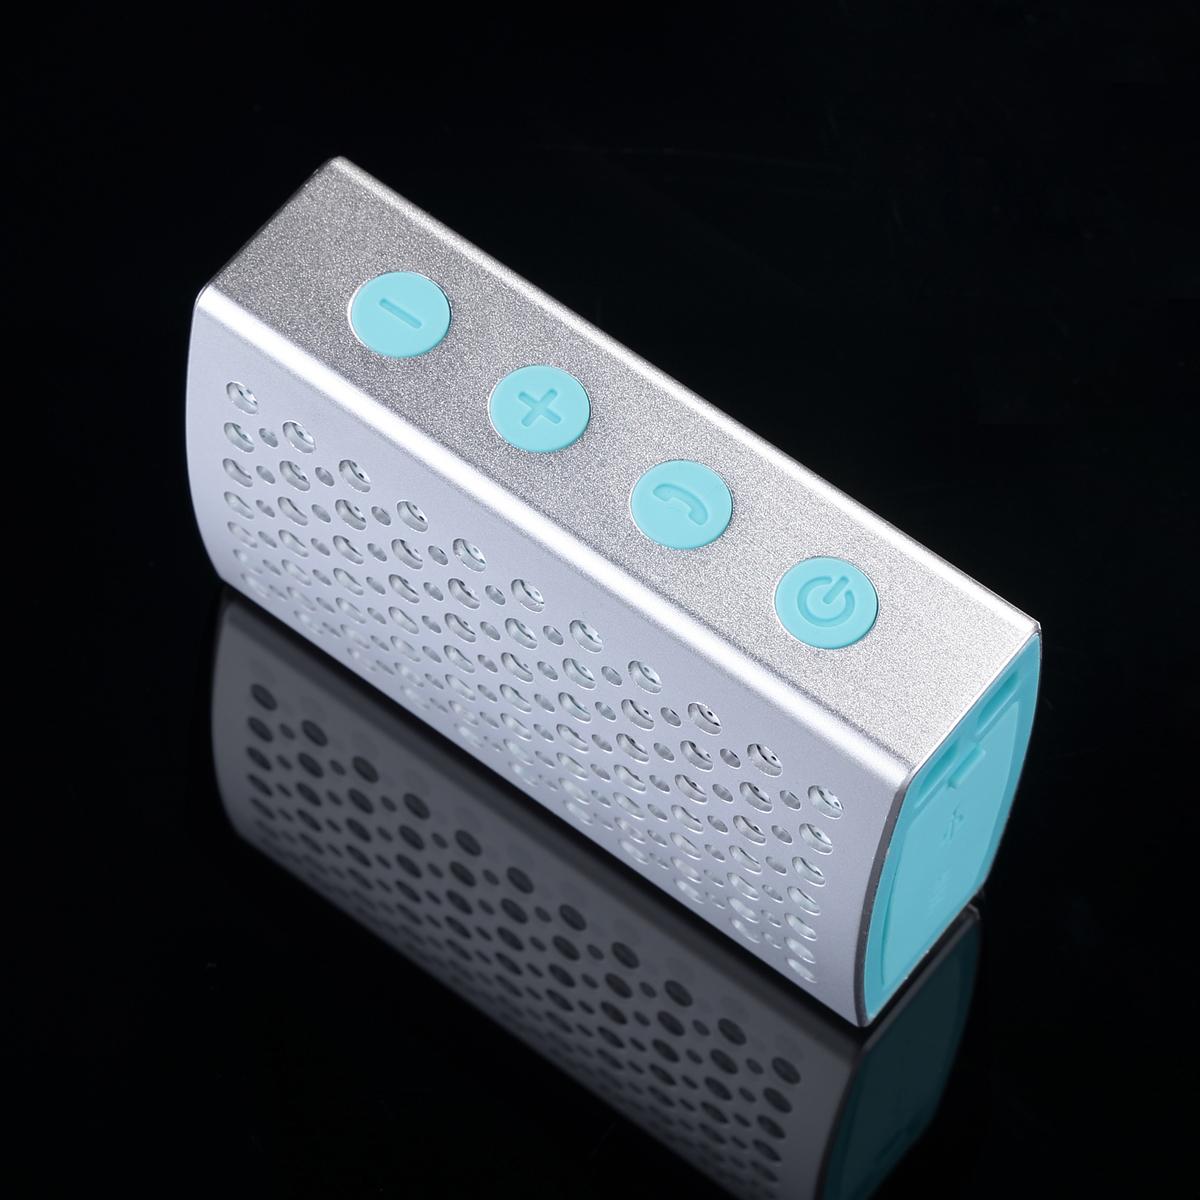 wasserdichte portable bluetooth mp3 lautsprecher f r smartphones handys tablets ebay. Black Bedroom Furniture Sets. Home Design Ideas